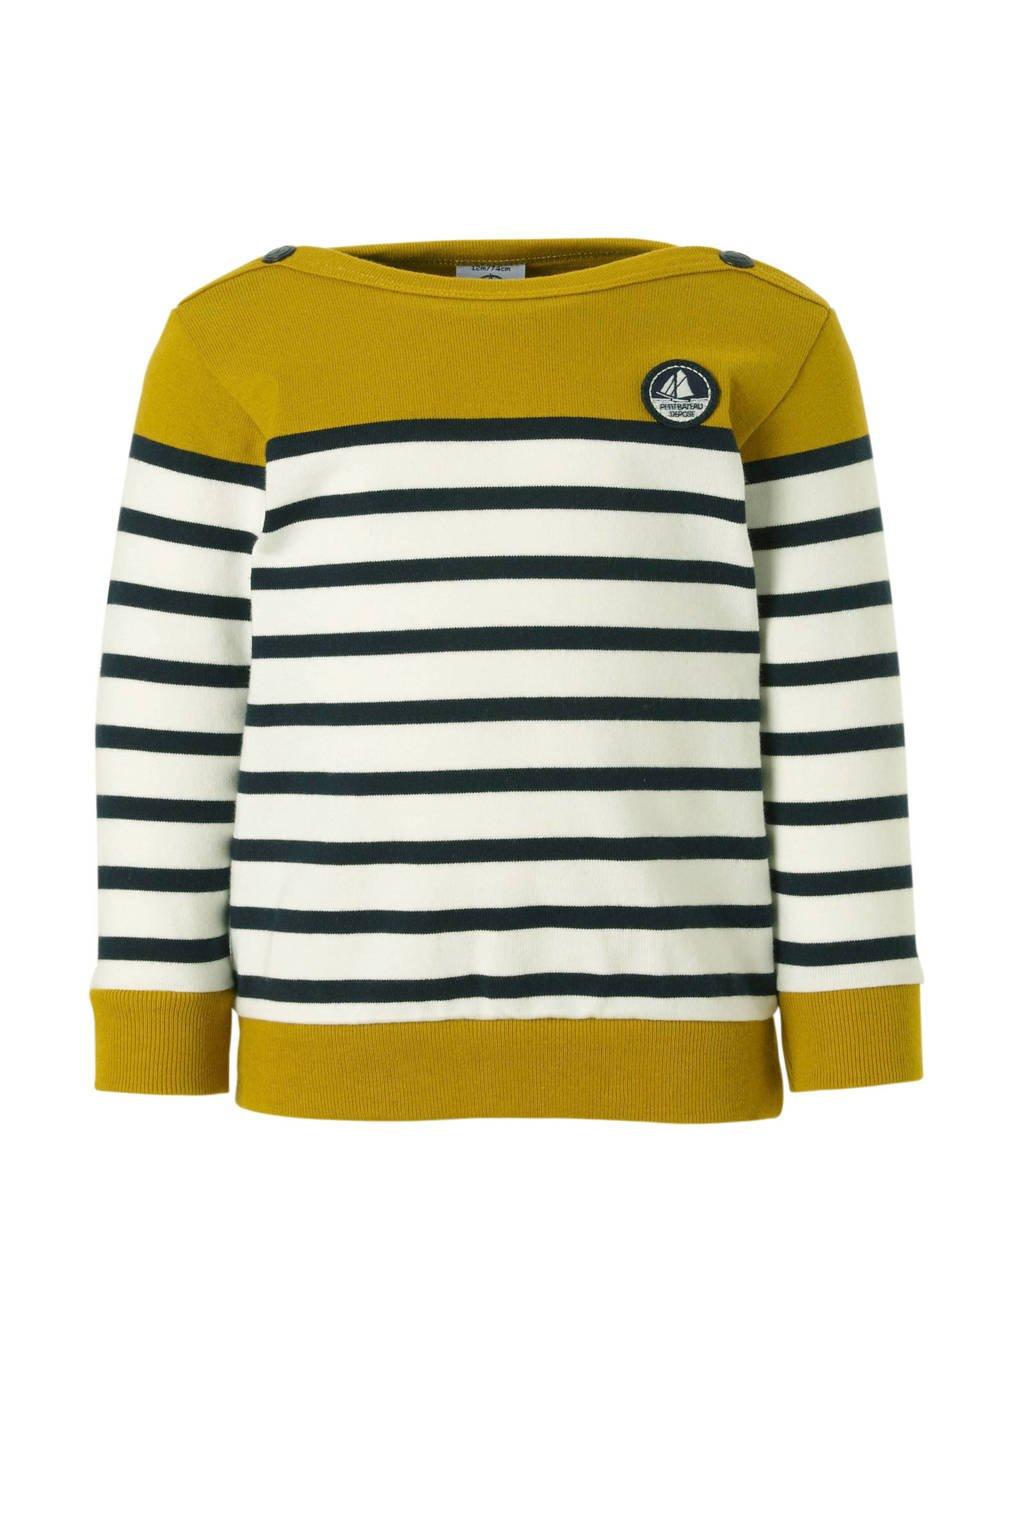 Petit Bateau gestreepte sweater, Limegroen/ zwart/ off white